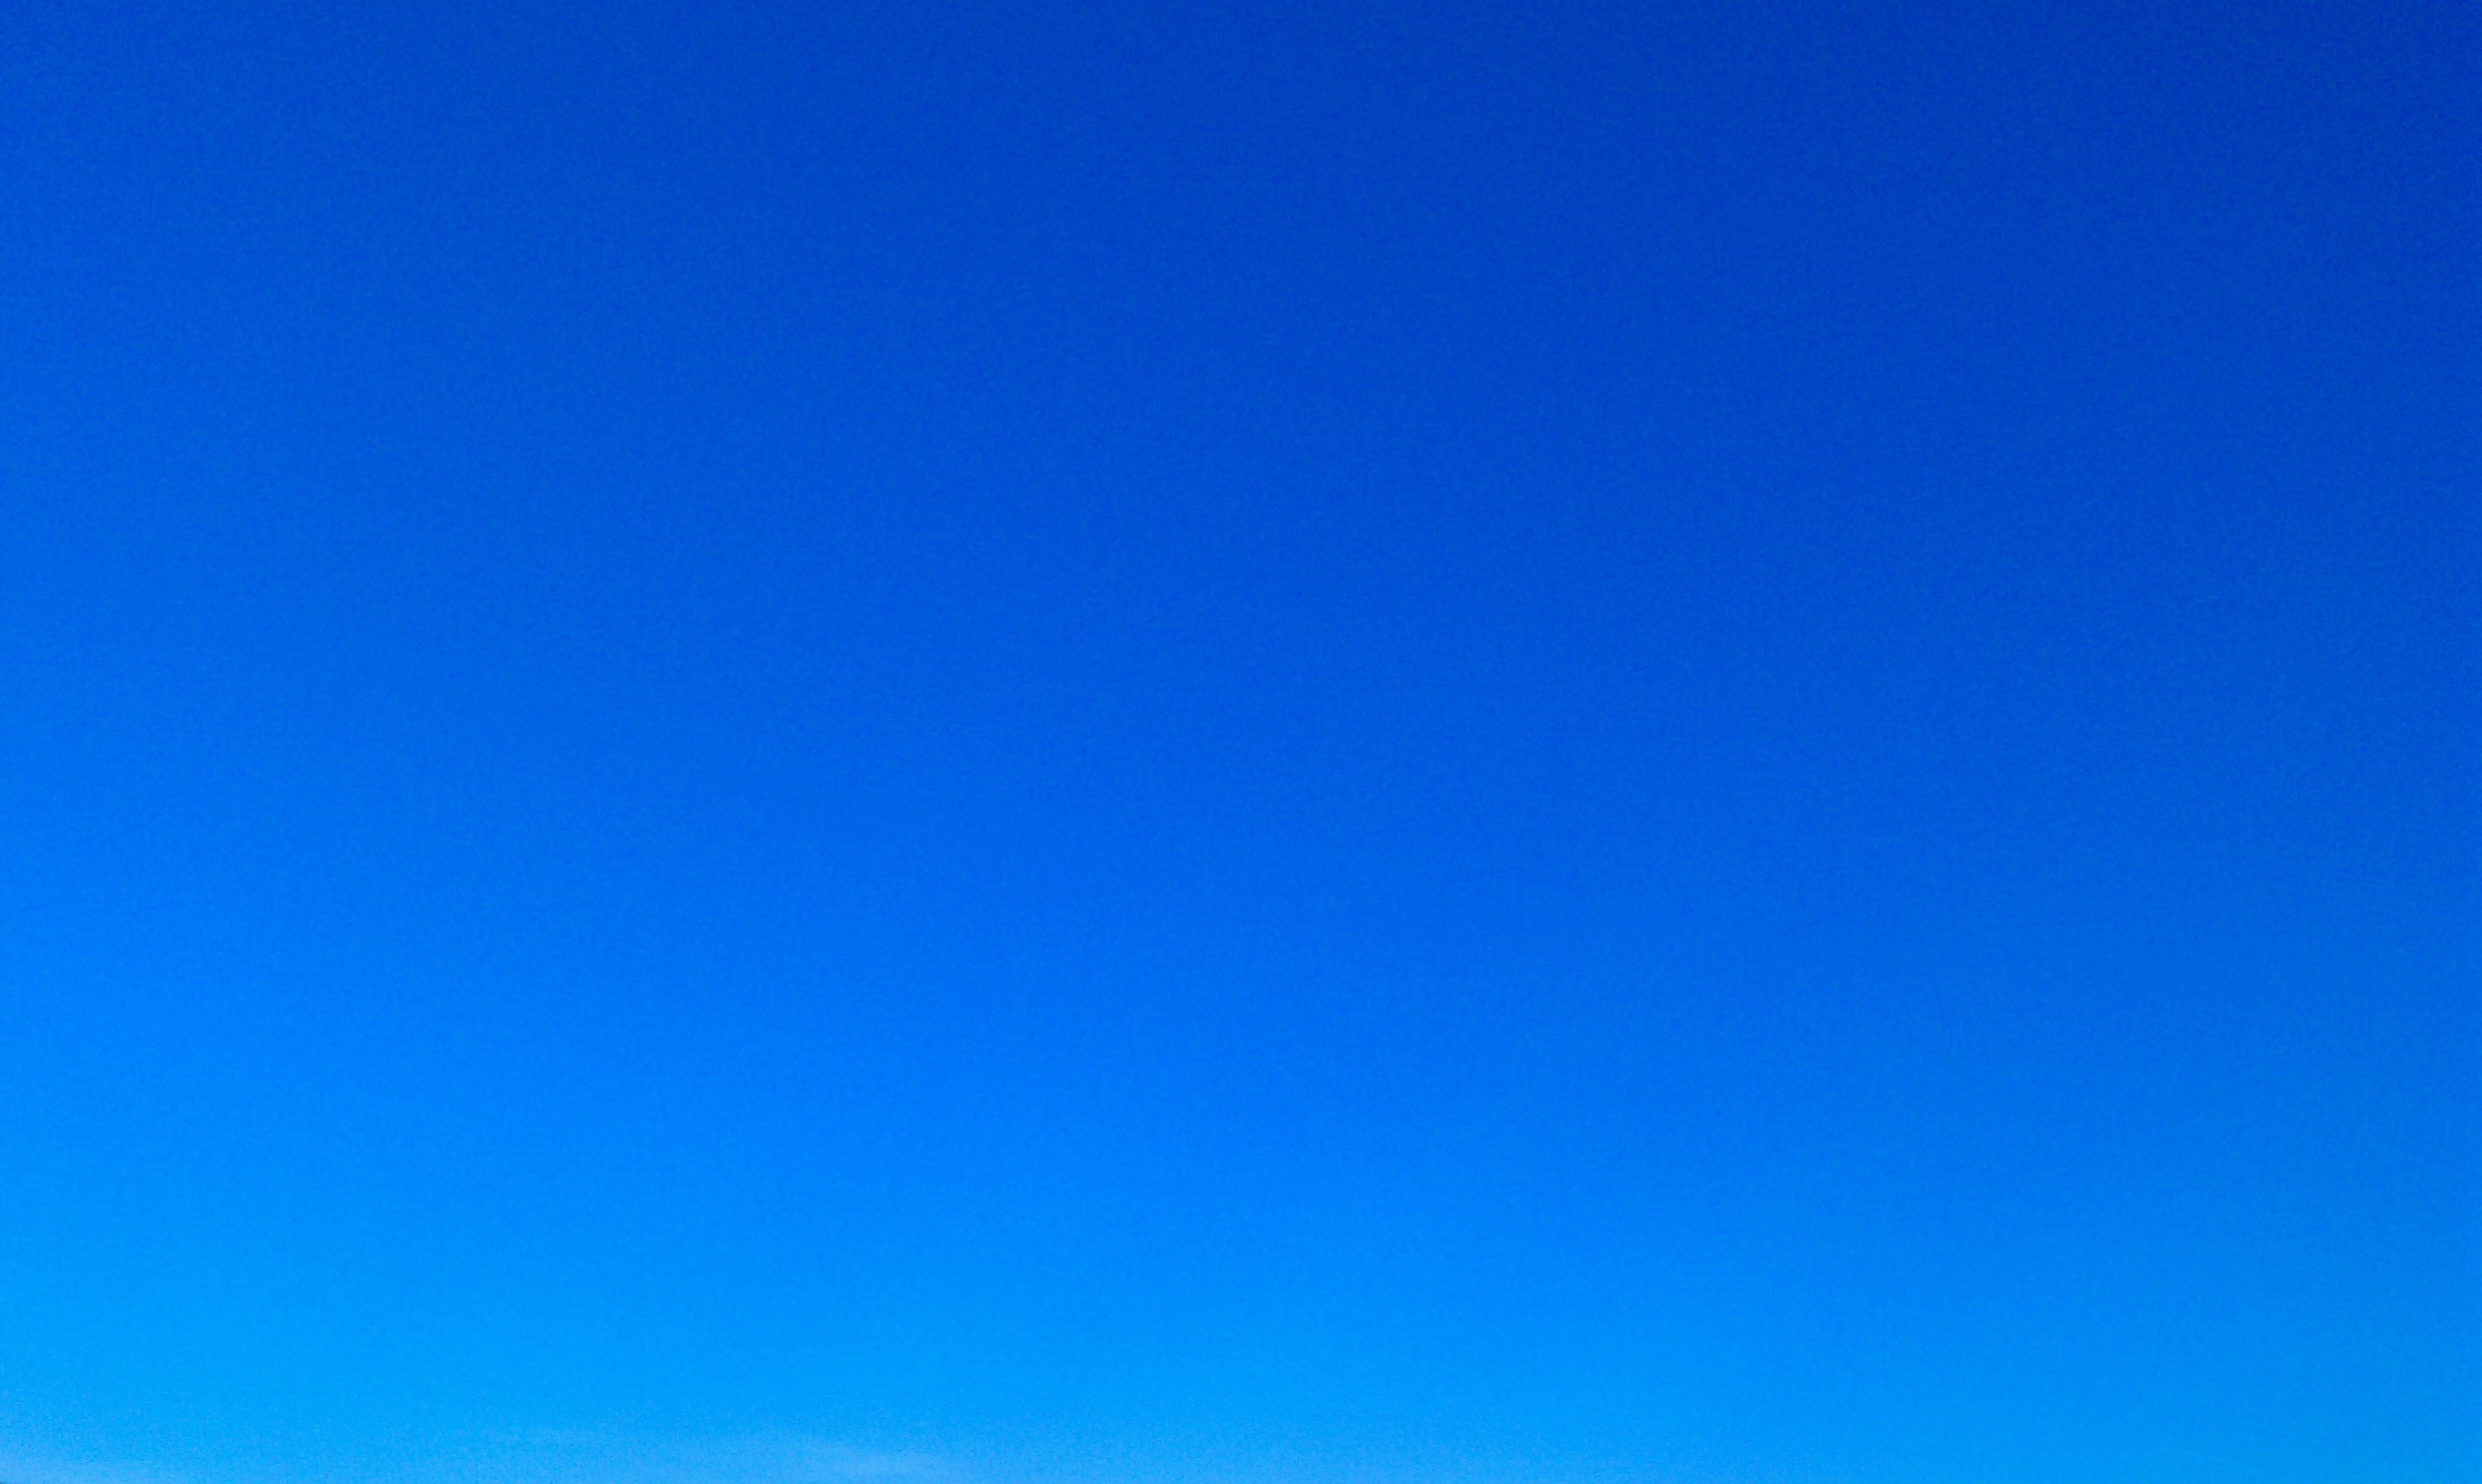 Blue Sky Wallpaper Hd: 3264x1952px Sky Blue Wallpaper